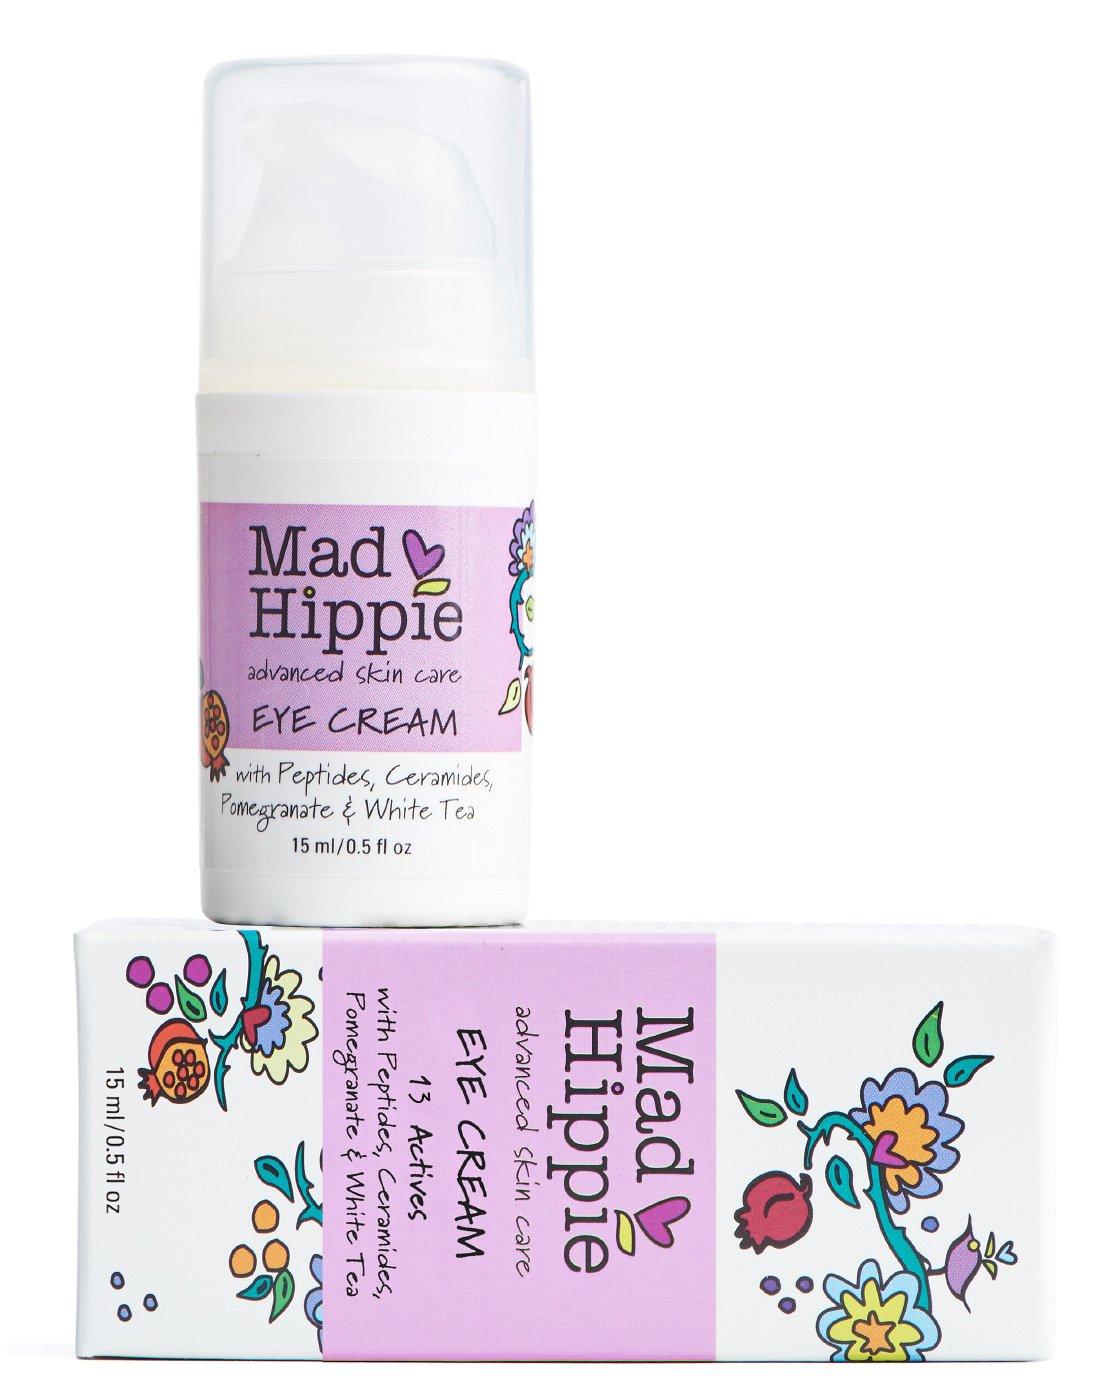 MAD Hippie Eye CRM,Anti-OXIDNT/PEPT.5 OZ by Mad Hippie by MAD HIPPIE EYE CRM,ANTI-OXIDNT/PEPT.5 OZ by Mad Hipp